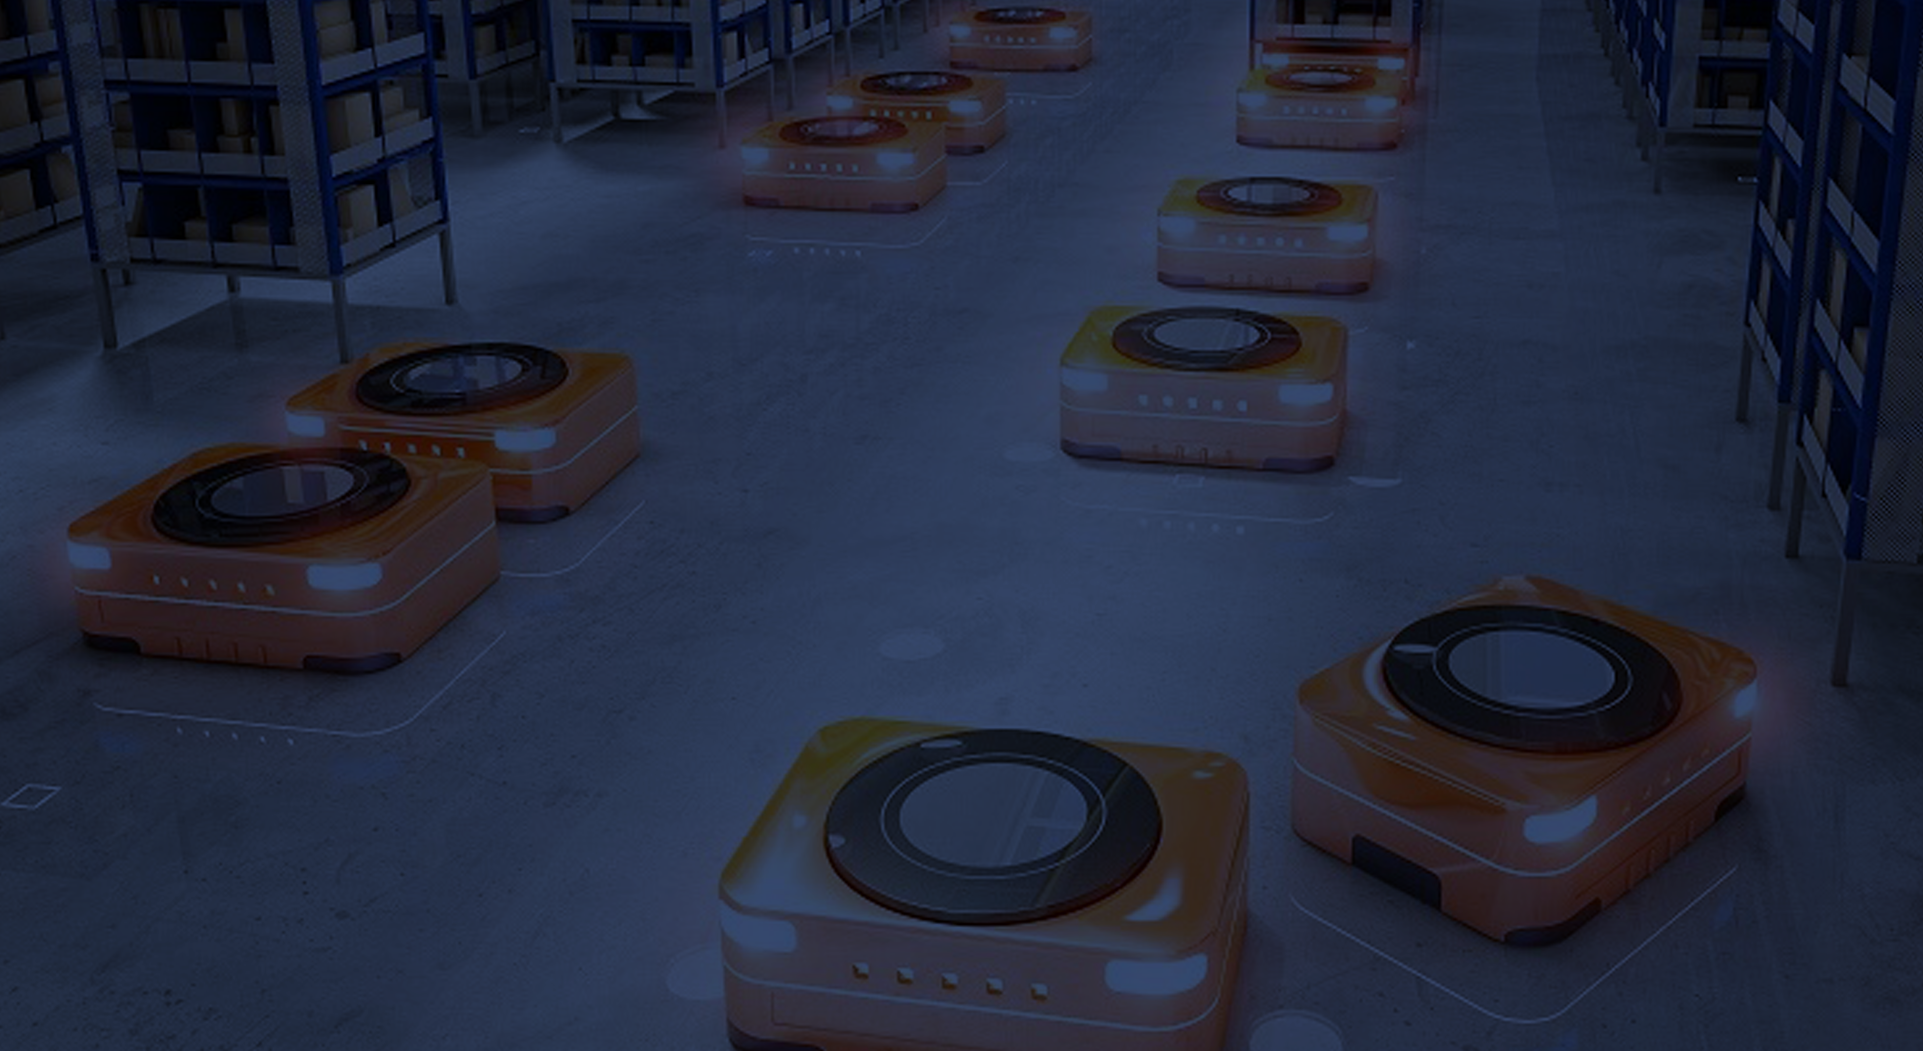 Mobile Robots – Sep 2020